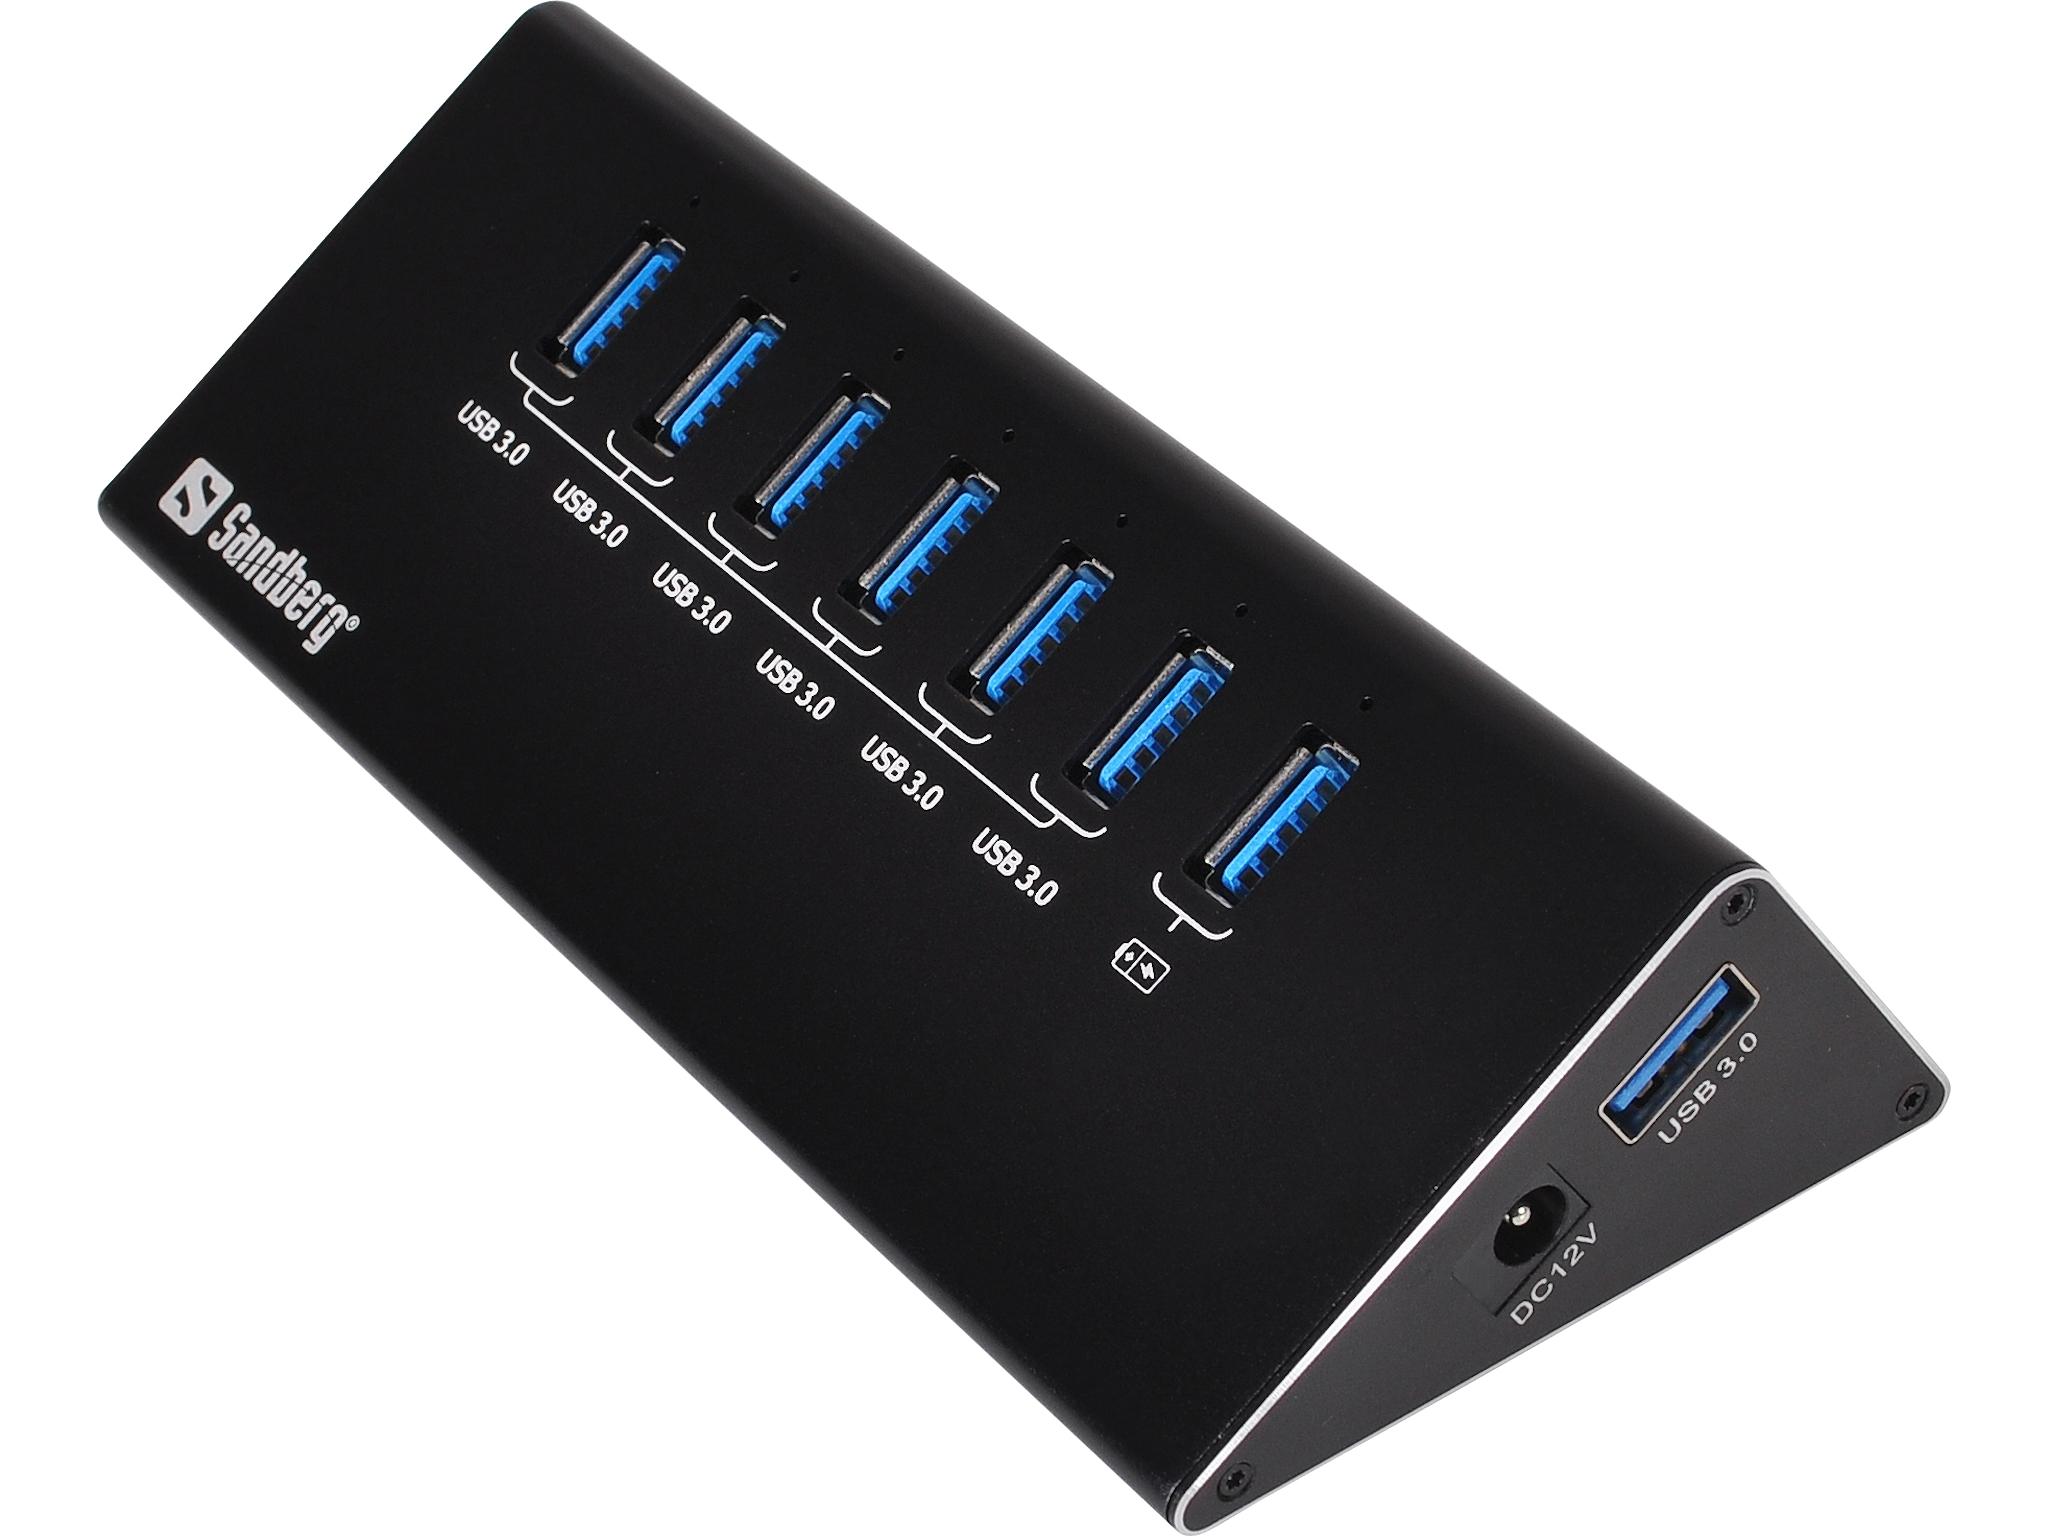 SANDBERG A/S Sandberg USB 3.0 Hub 6+1 ports